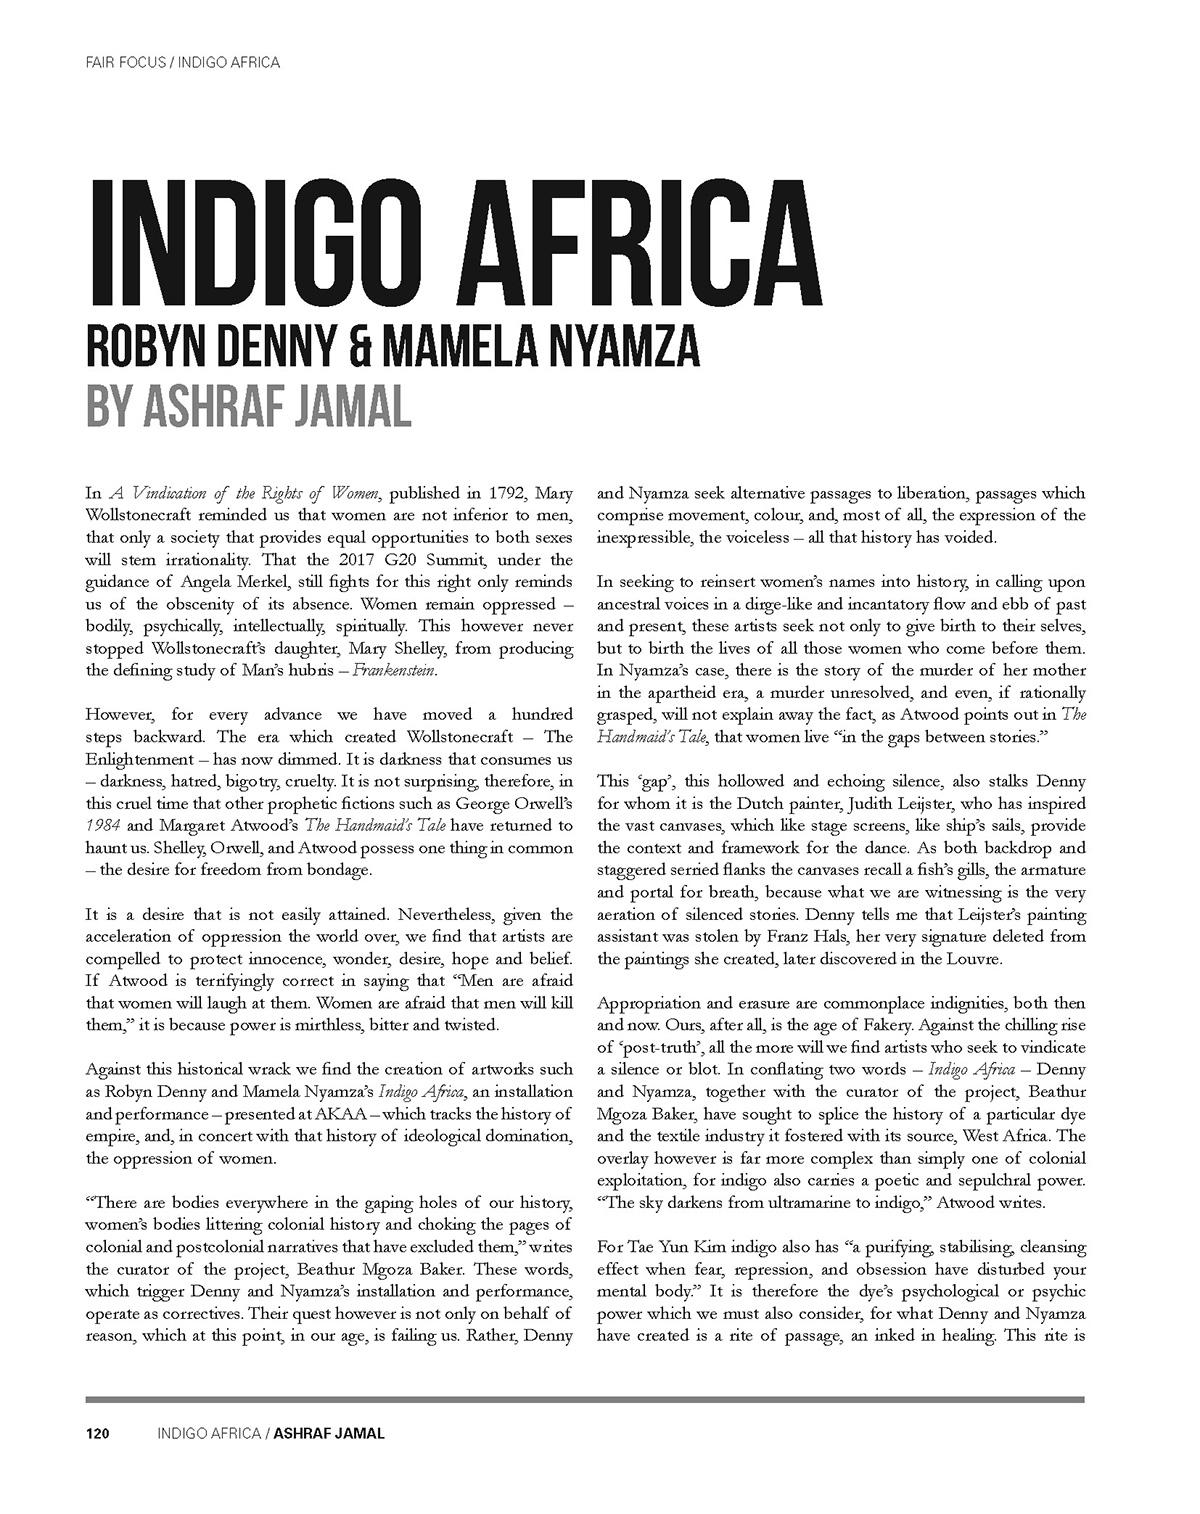 AshrafJamal_IndigioAfrica_Page_1